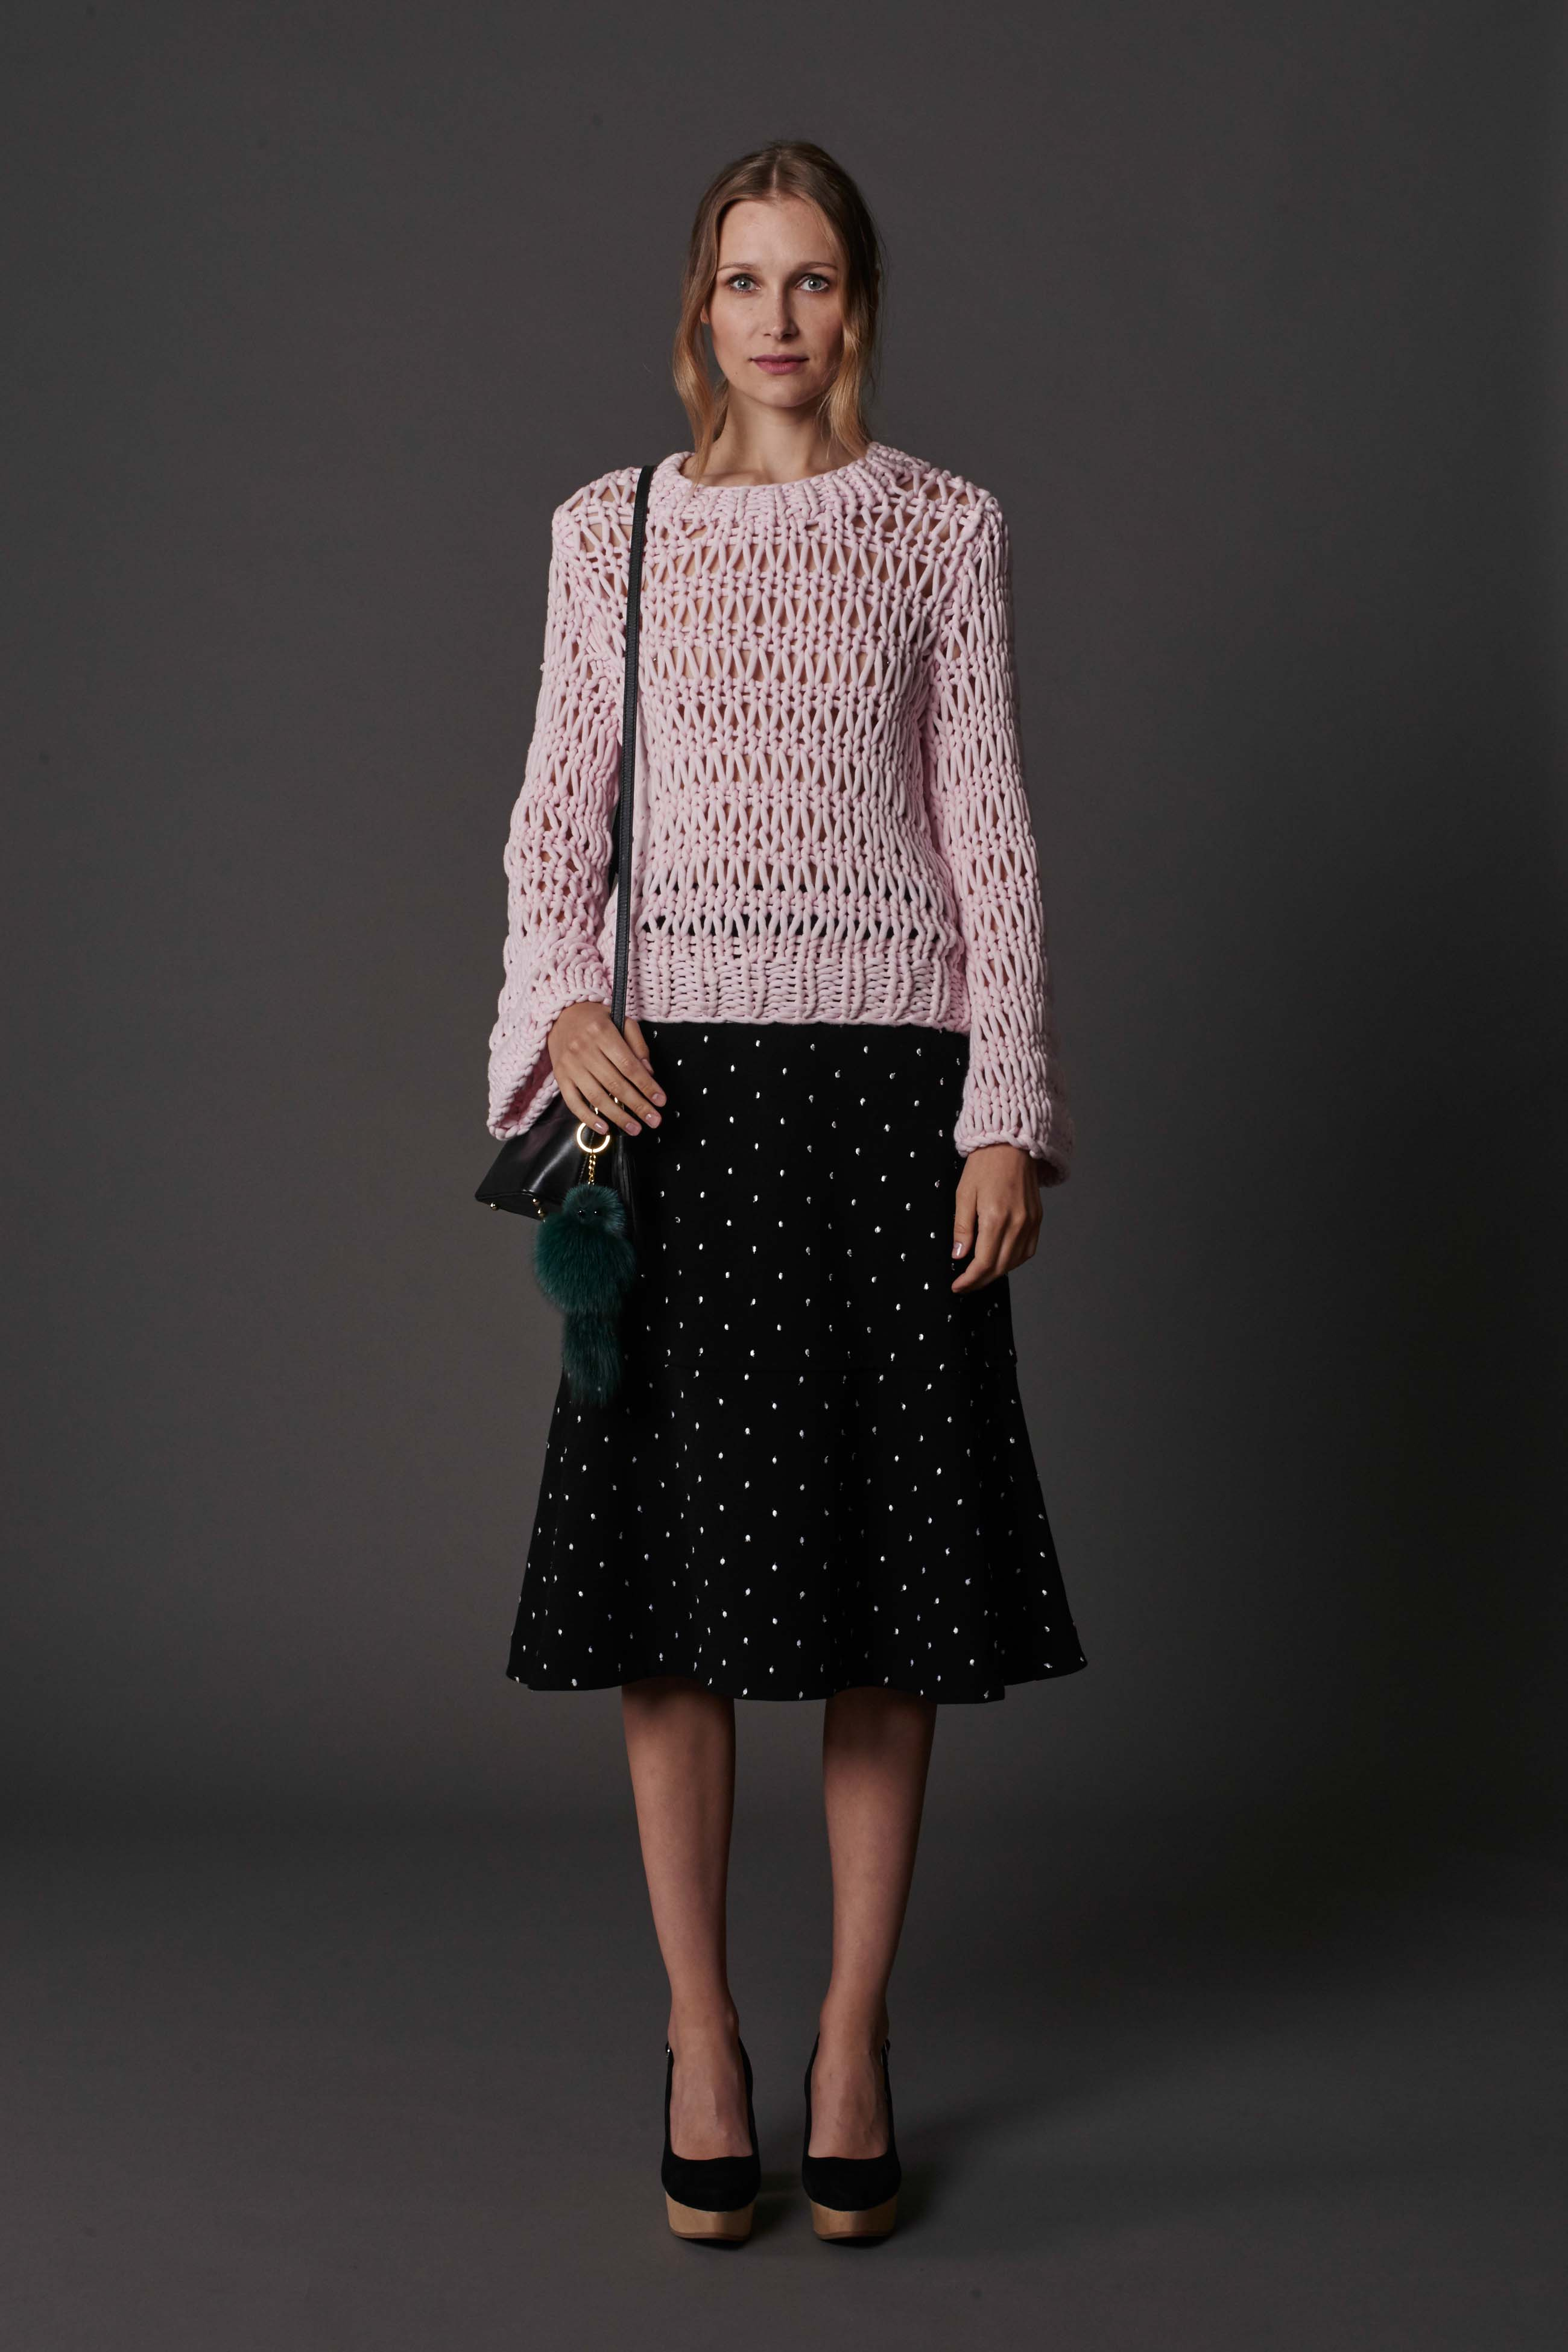 RUBY Alpine Sweater, Halo Skirt, Lila Shoulder Bag & Halo Heel